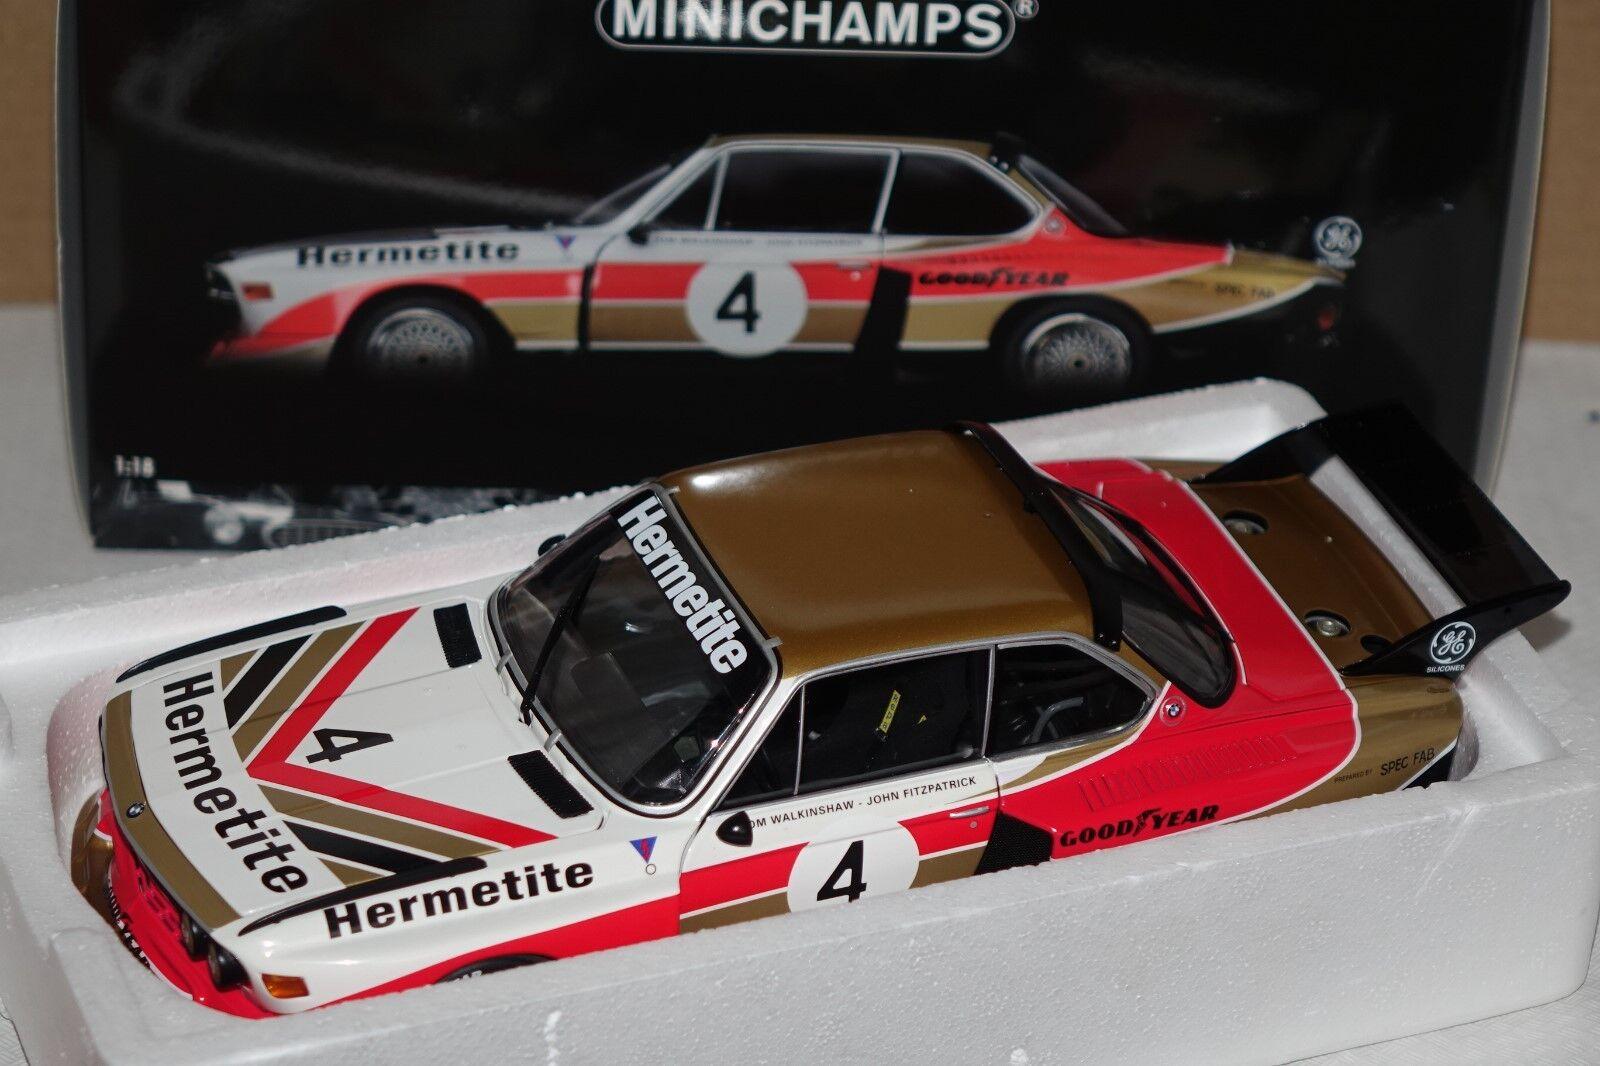 Bmw 3,5 CSL talla 5 winner 6h Platastone 1976 1 18 Minichamps 180762004 nuevo & OVP